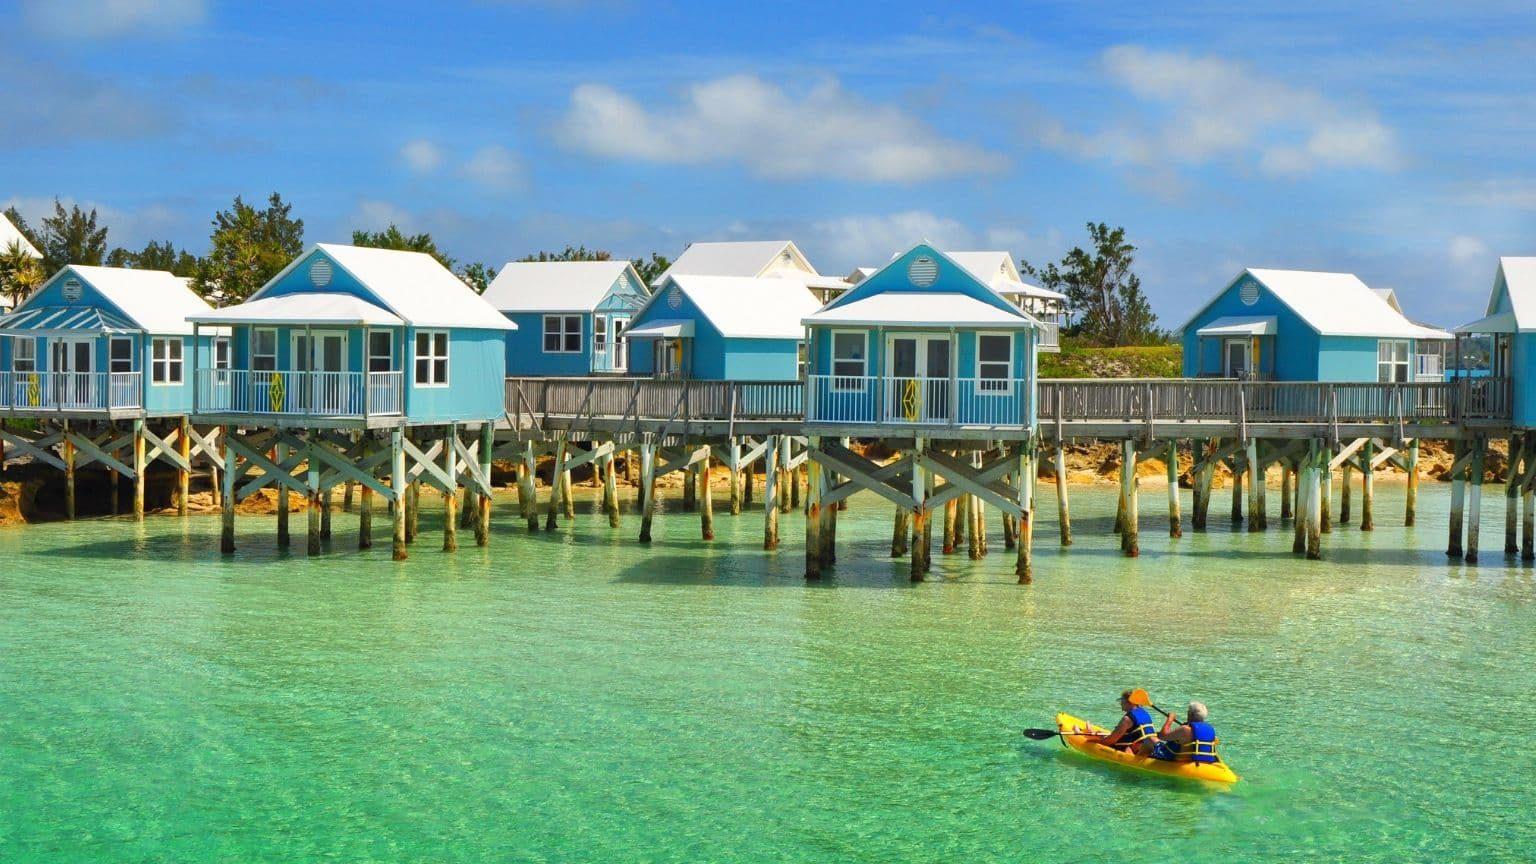 House on stilts in Bermuda